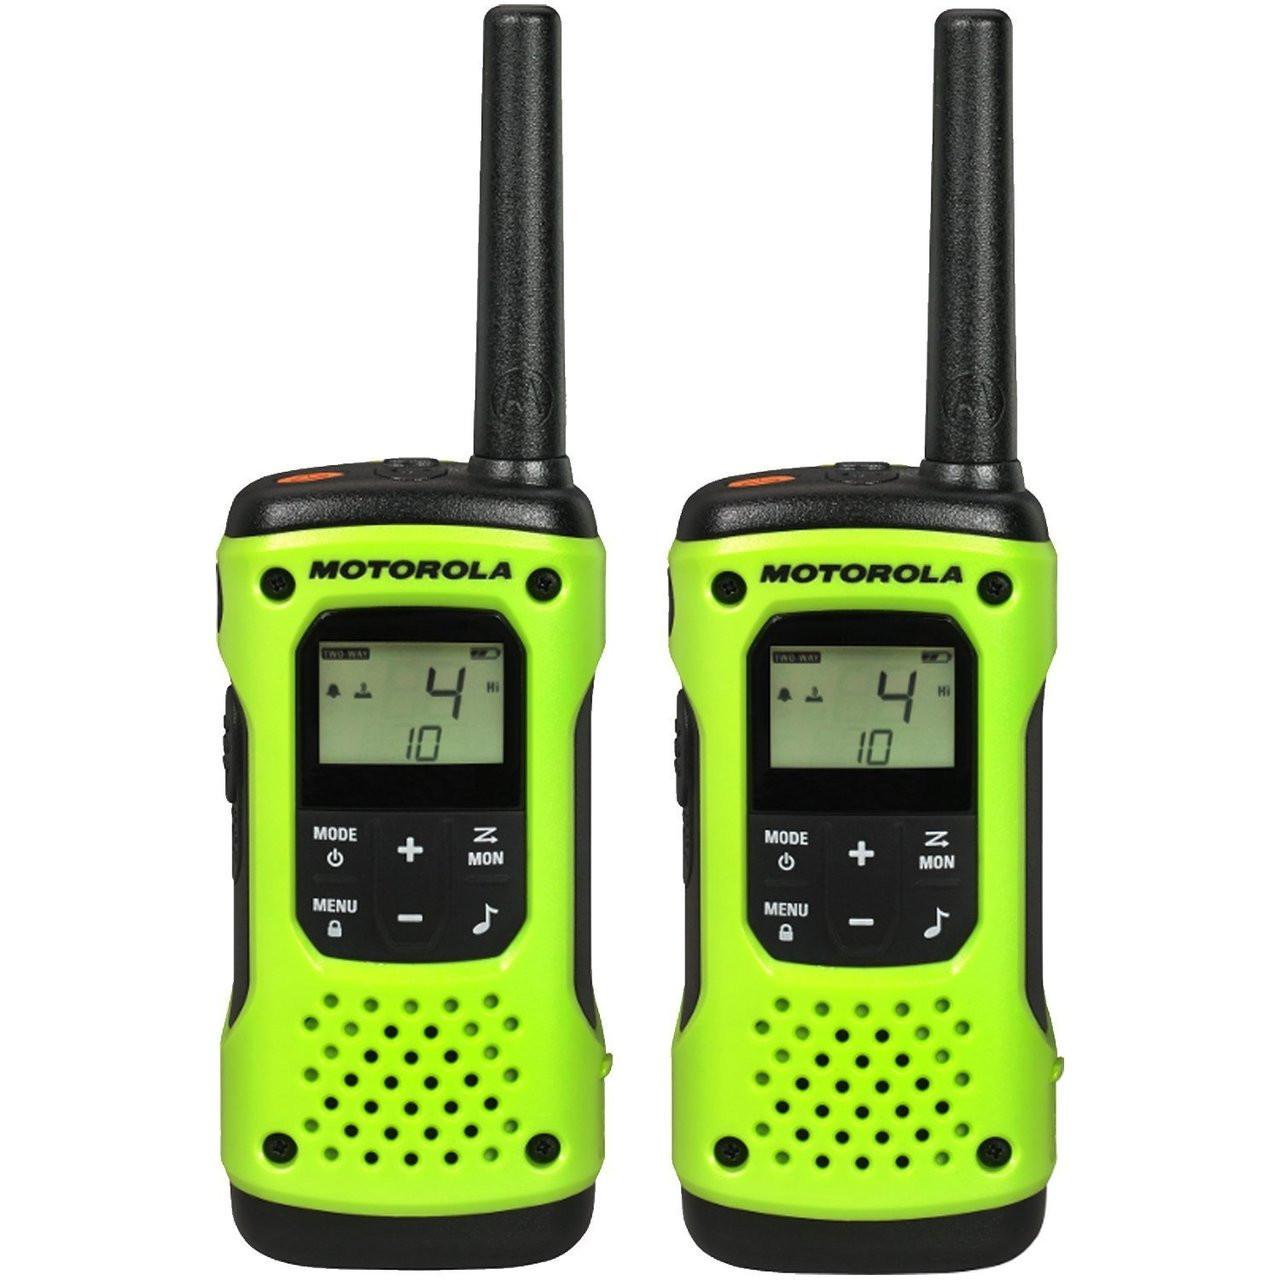 Motorola T600 Talkabout Two way Radios